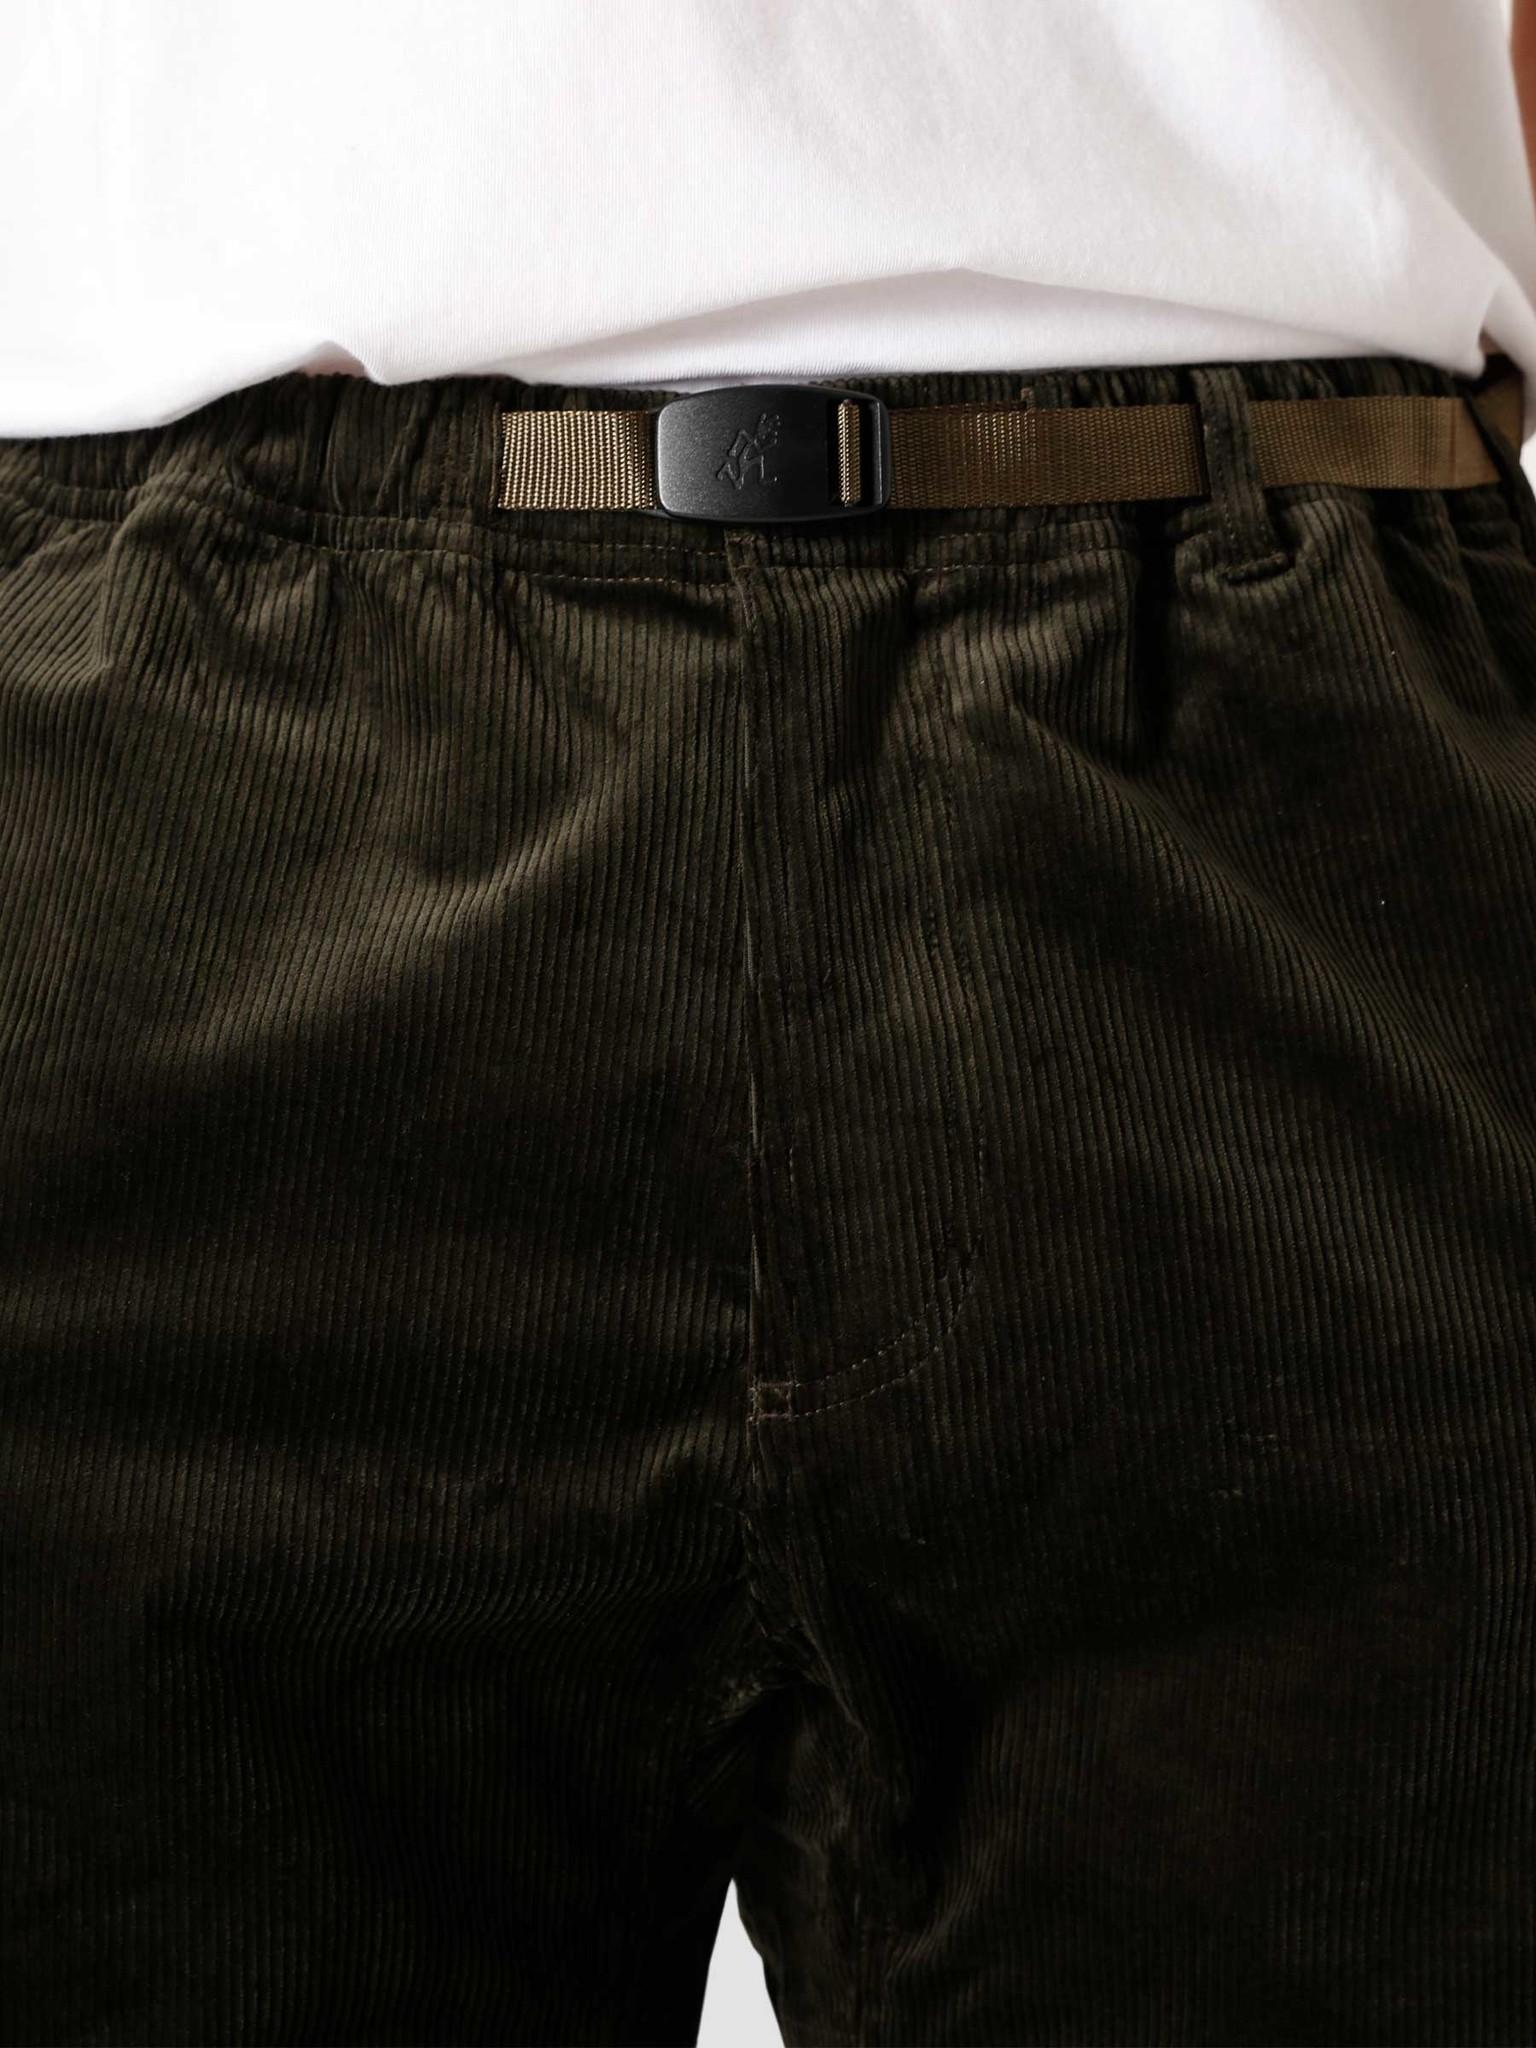 Gramicci Gramicci Corduroy Gramicci Pants Olive GMP-20F018